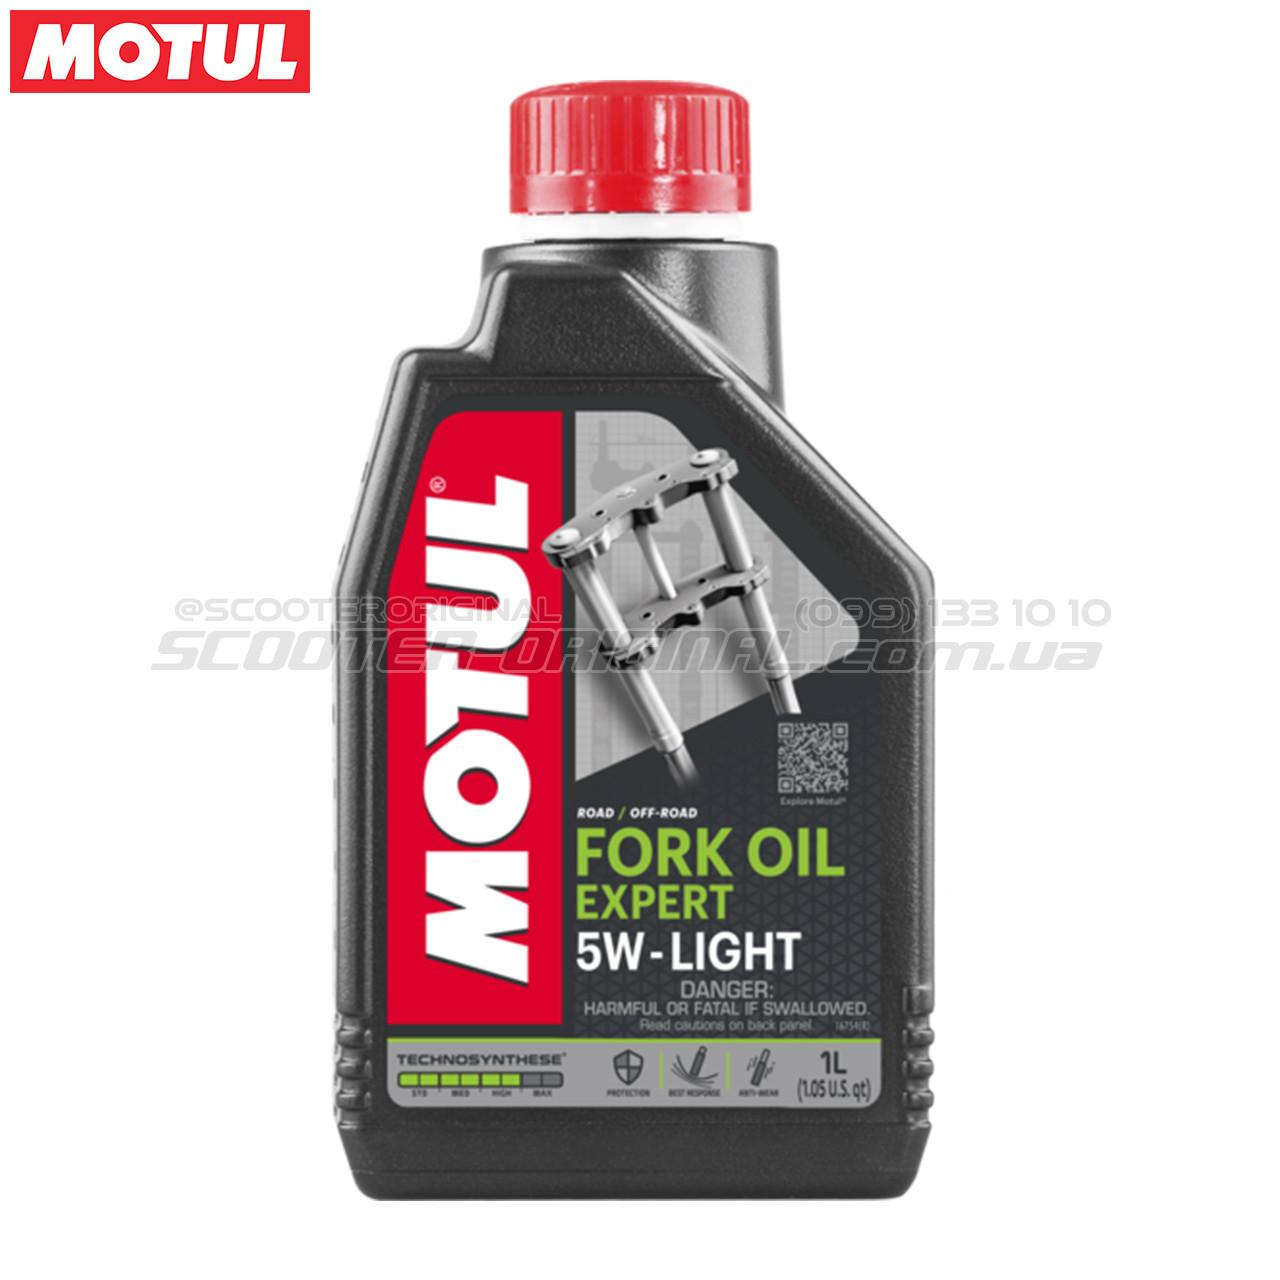 Гидравлическое масло MOTUL Fork Oil Expert Light 5W (1 литр)